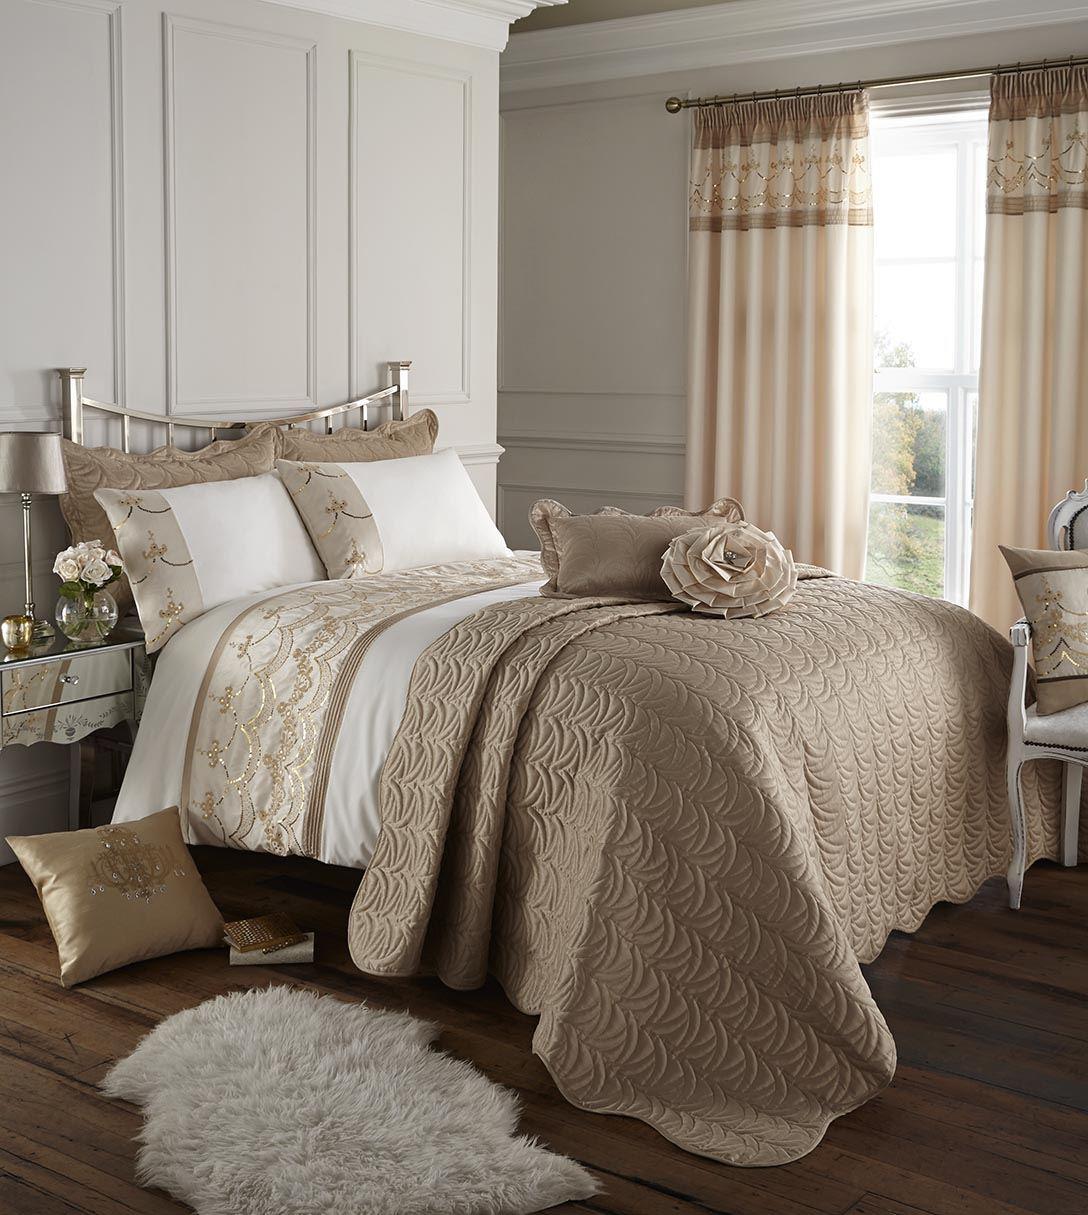 catherine lansfield charlston gold luxury sequin glittering bedding duvet cover